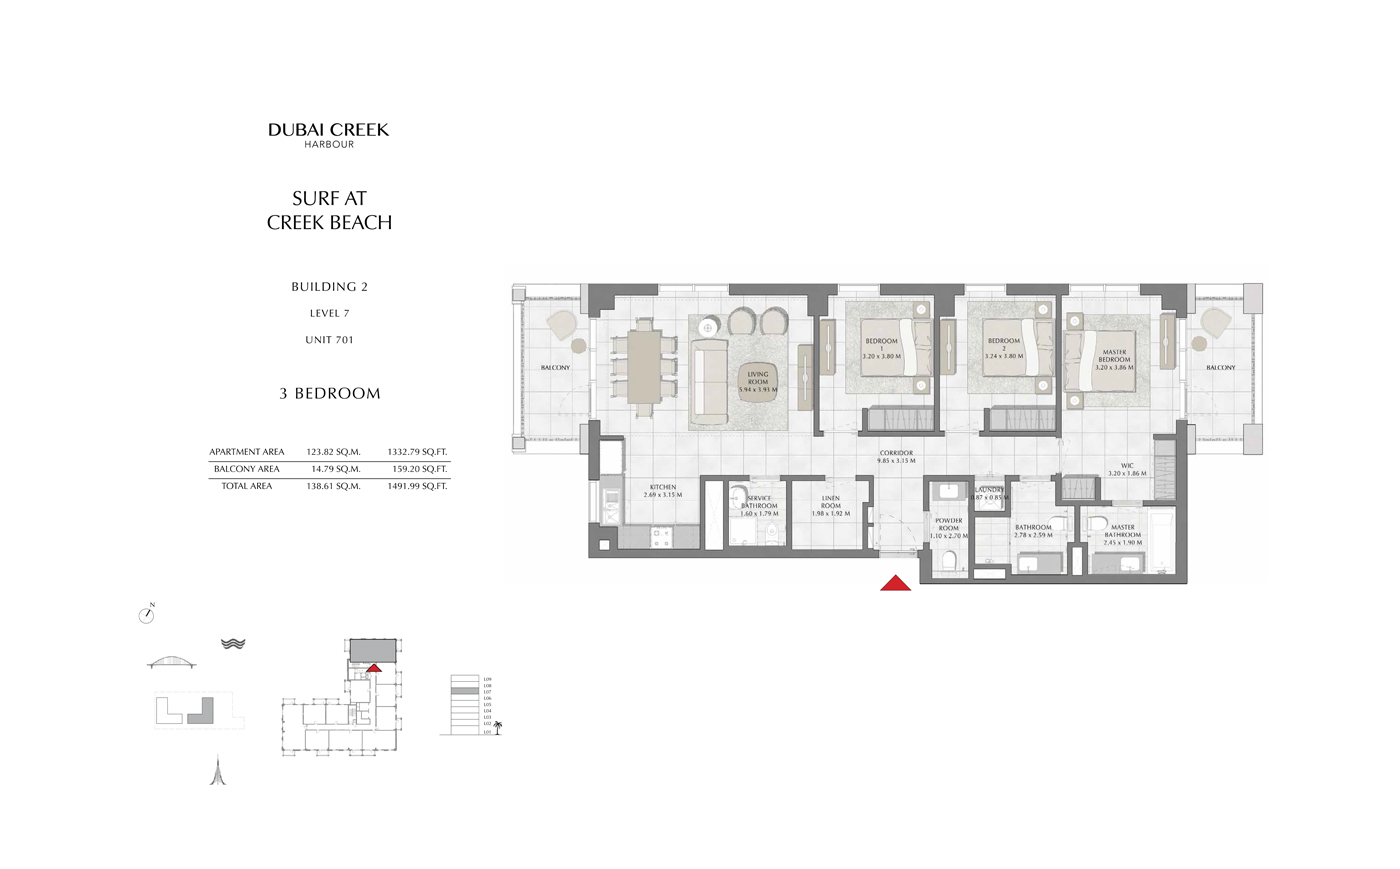 Building 2, 1 Bedroom Level 2, 3 ,4, 5, 6 Size 678 Sq Ft